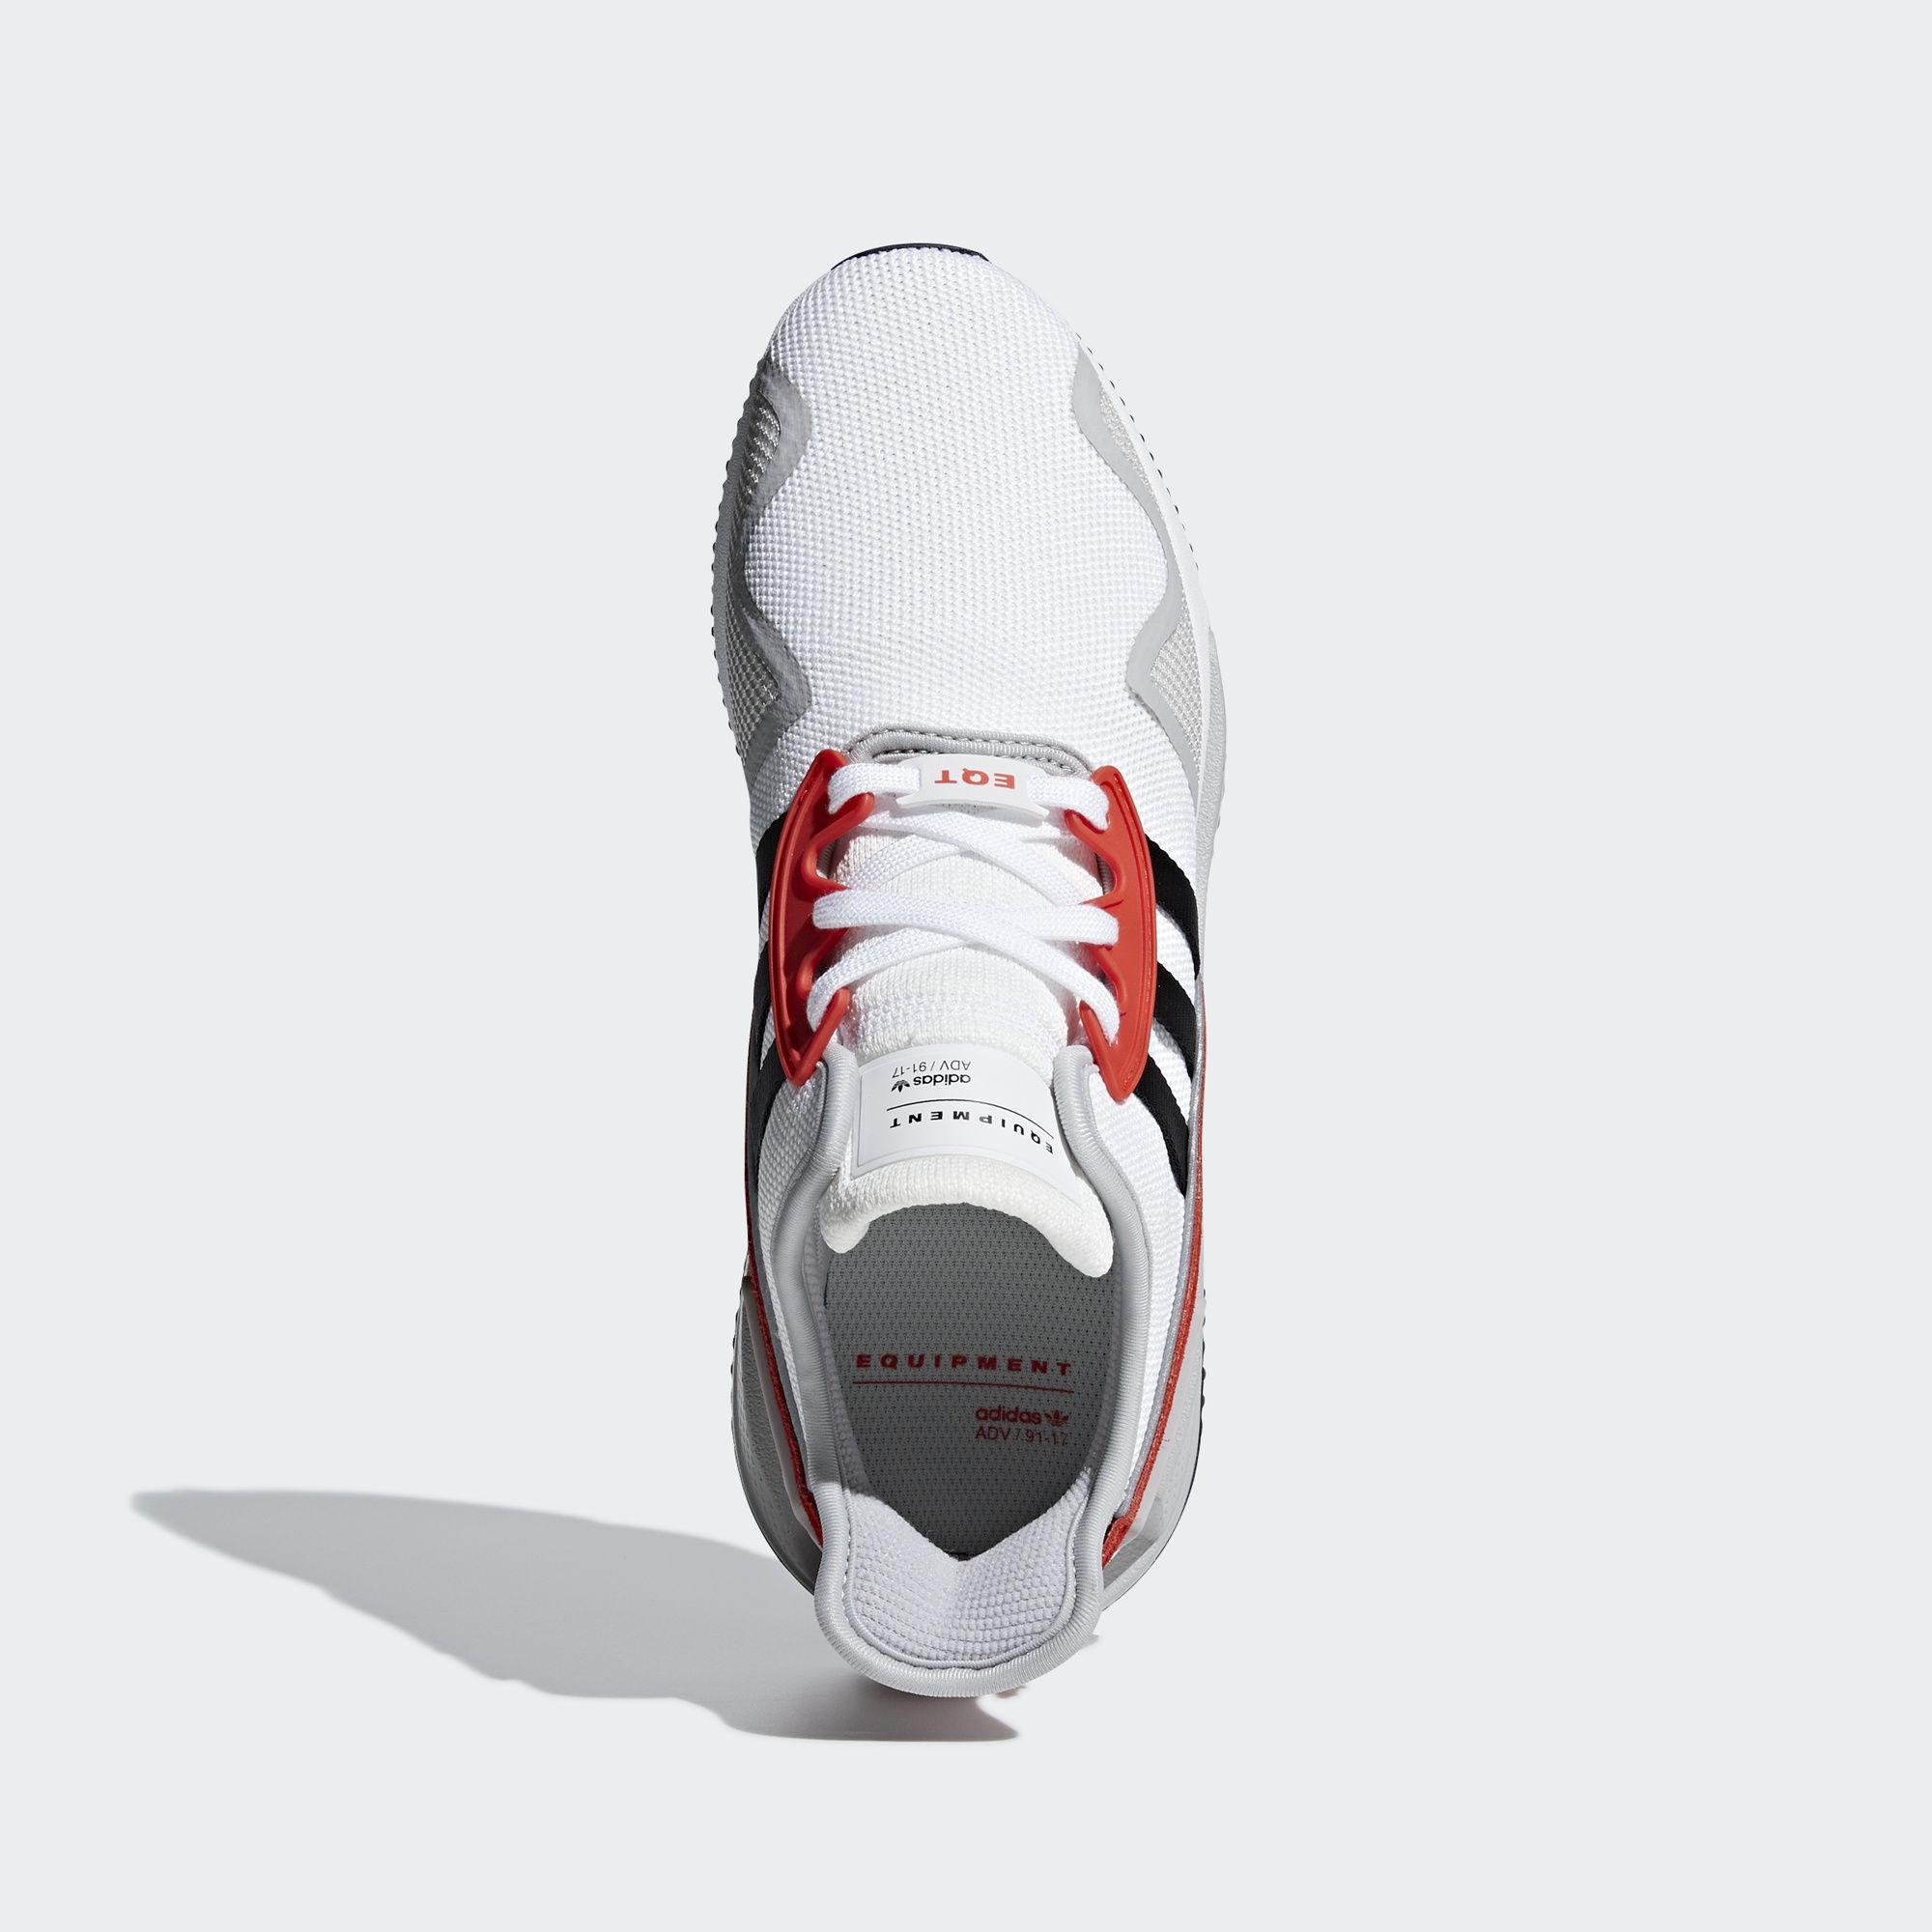 brand new e23fc 9ebaf Adidas Originals - Adidas Eqt Cushion Adv Ftw White Core Black Hi-res.  View fullscreen